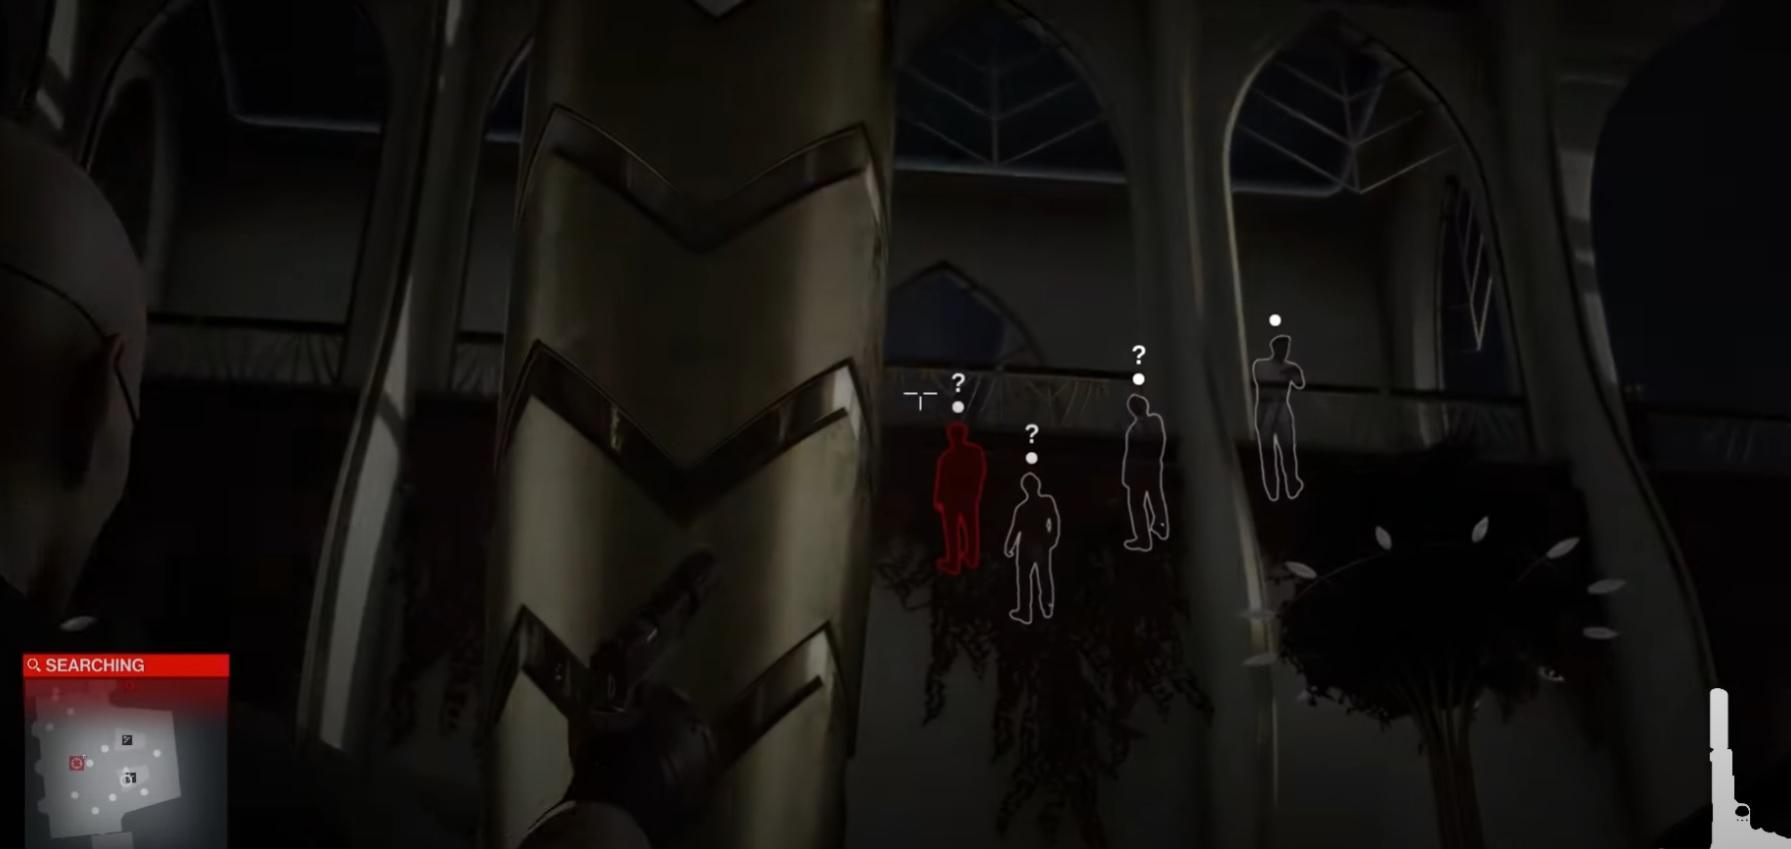 Hitman 3 speedrunning slaps screenshot